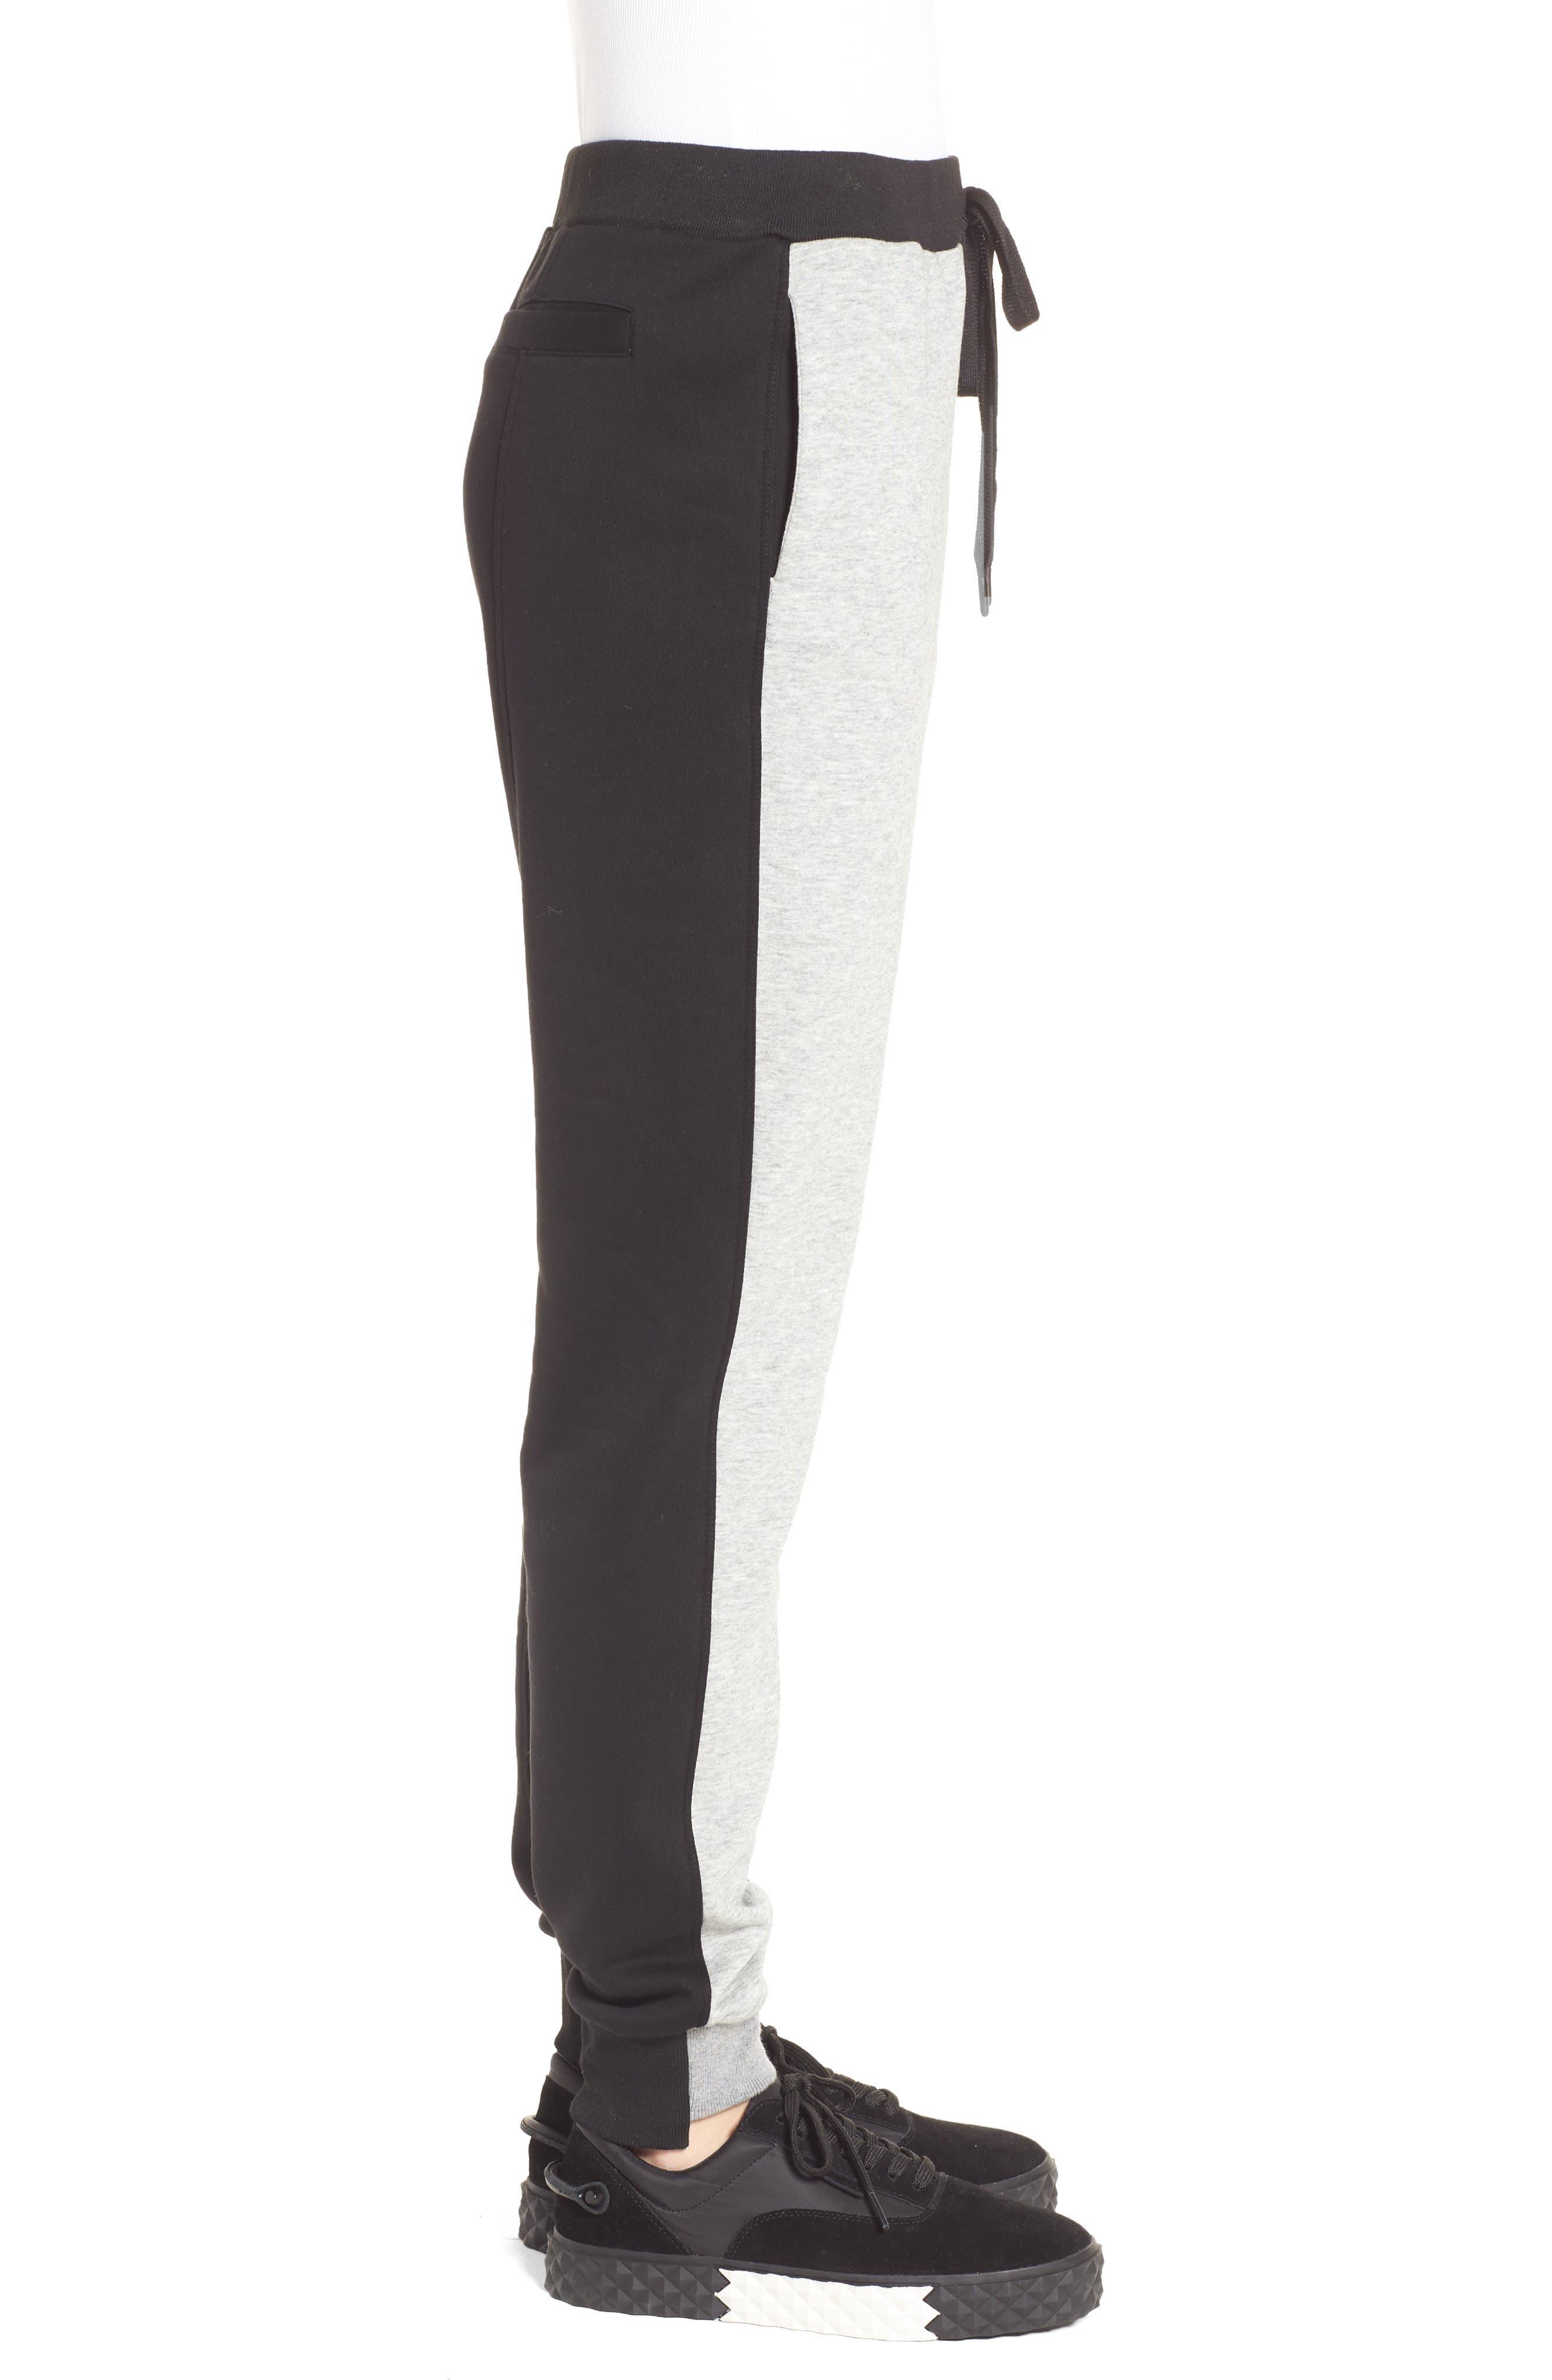 Paneled Sweatpants,                             Alternate thumbnail 3, color,                             Black/ Med. Heather Grey